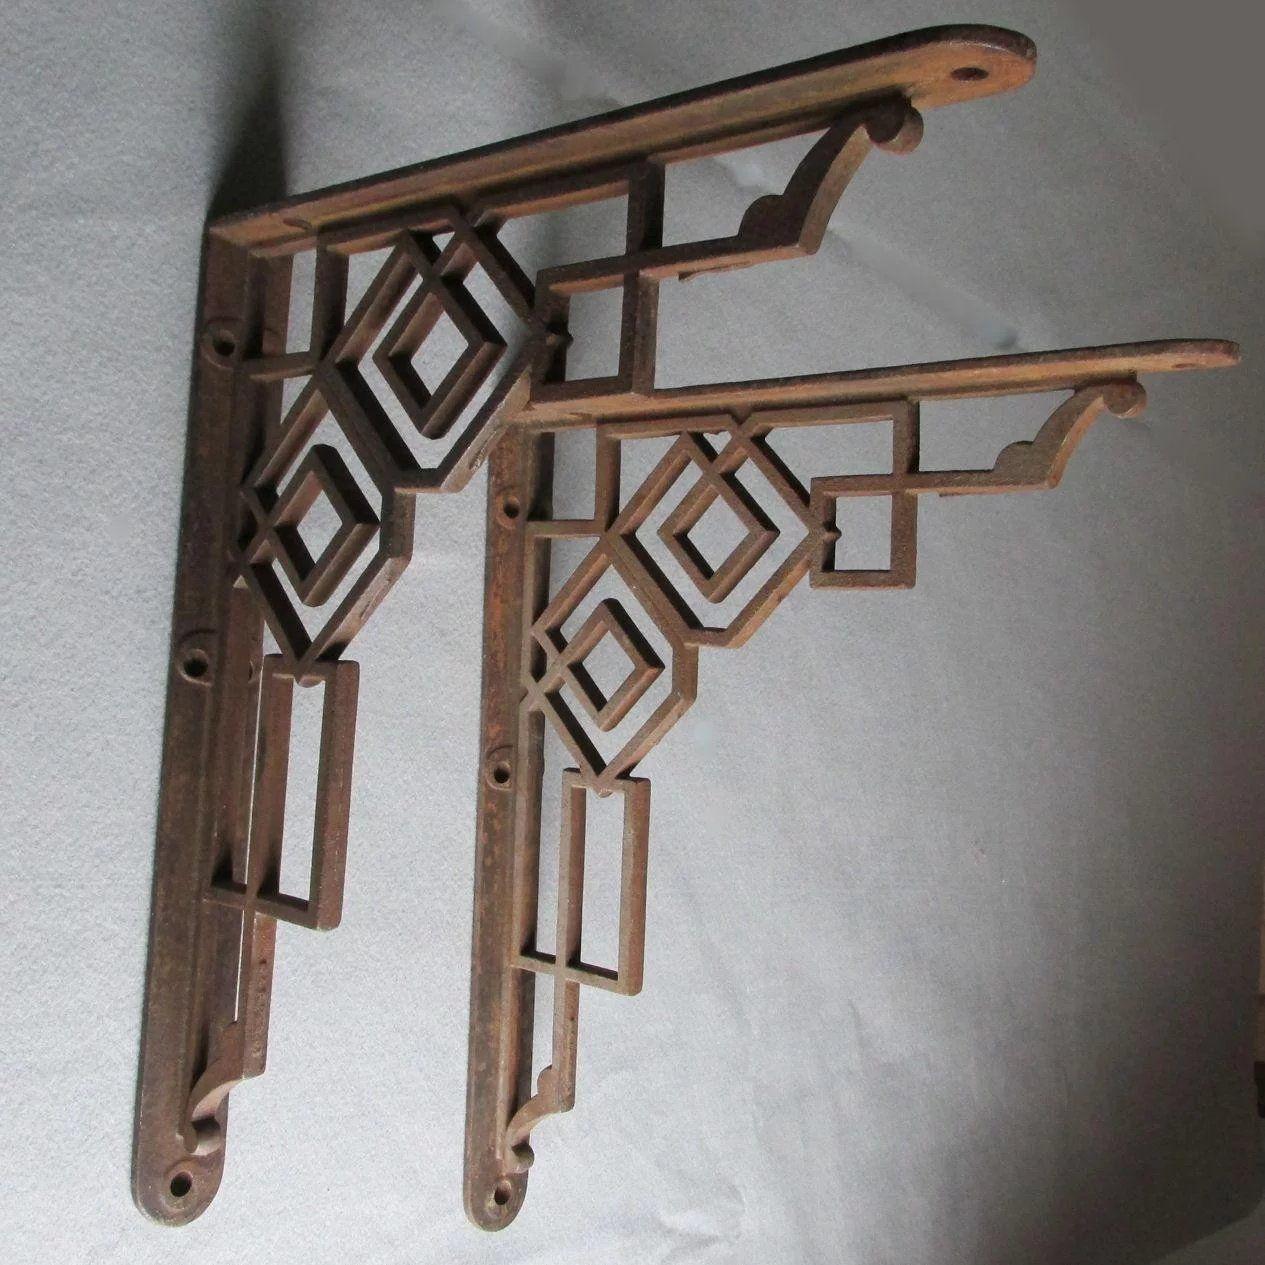 Large Antique Architectural Shelf Brackets Cast Iron Home Decor Architectural Antiques Antiques Architecture